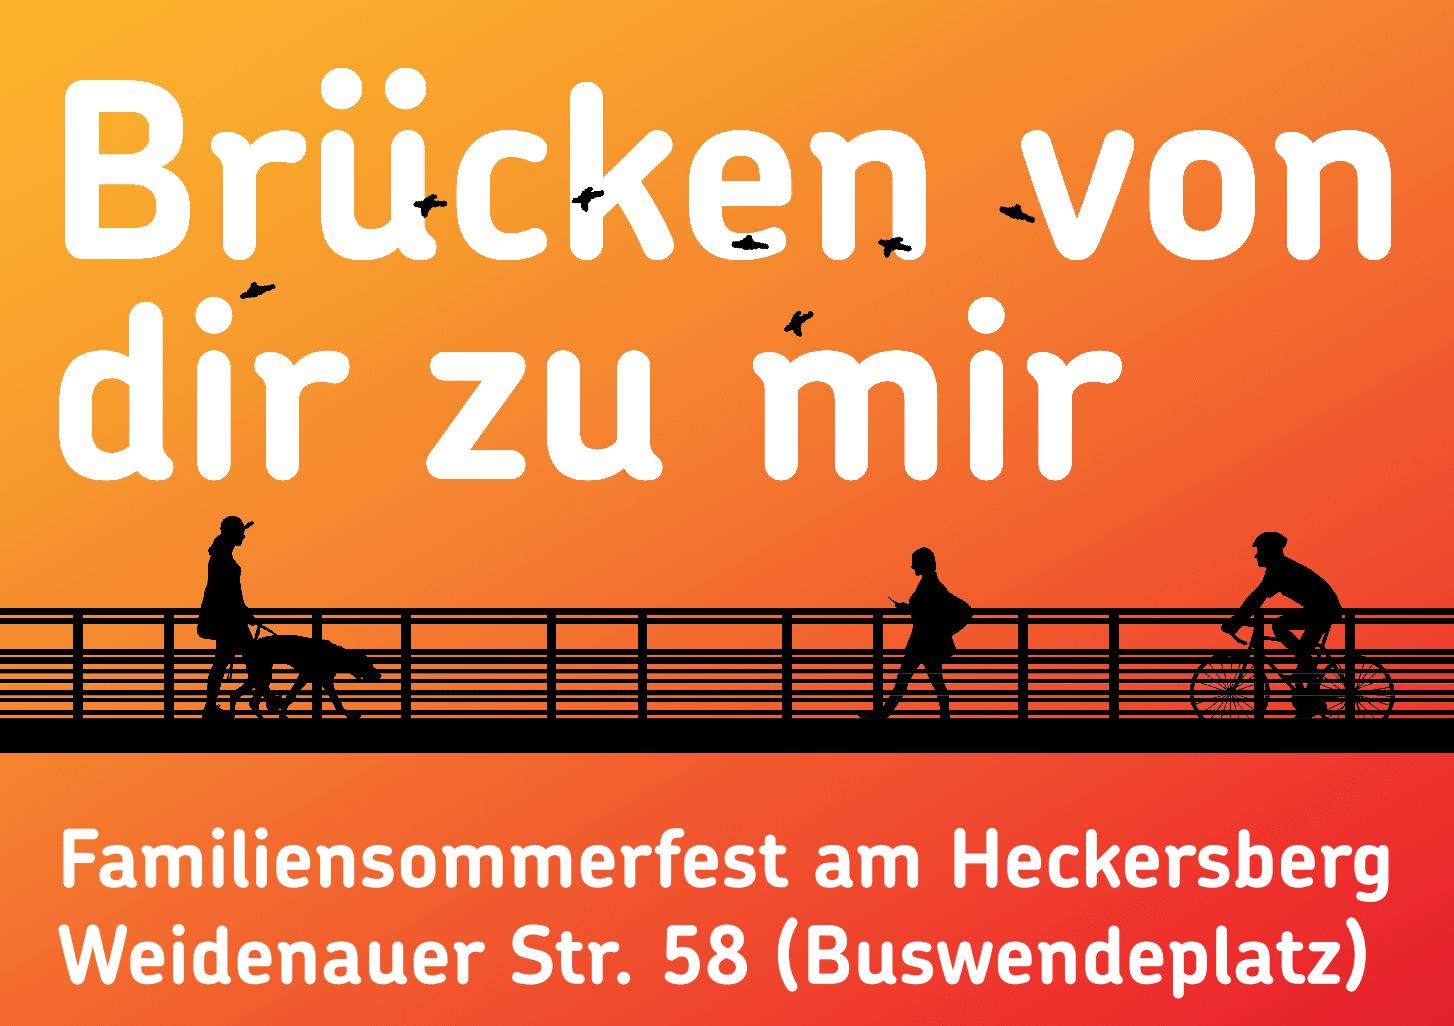 Familiensommerfest am Heckersberg